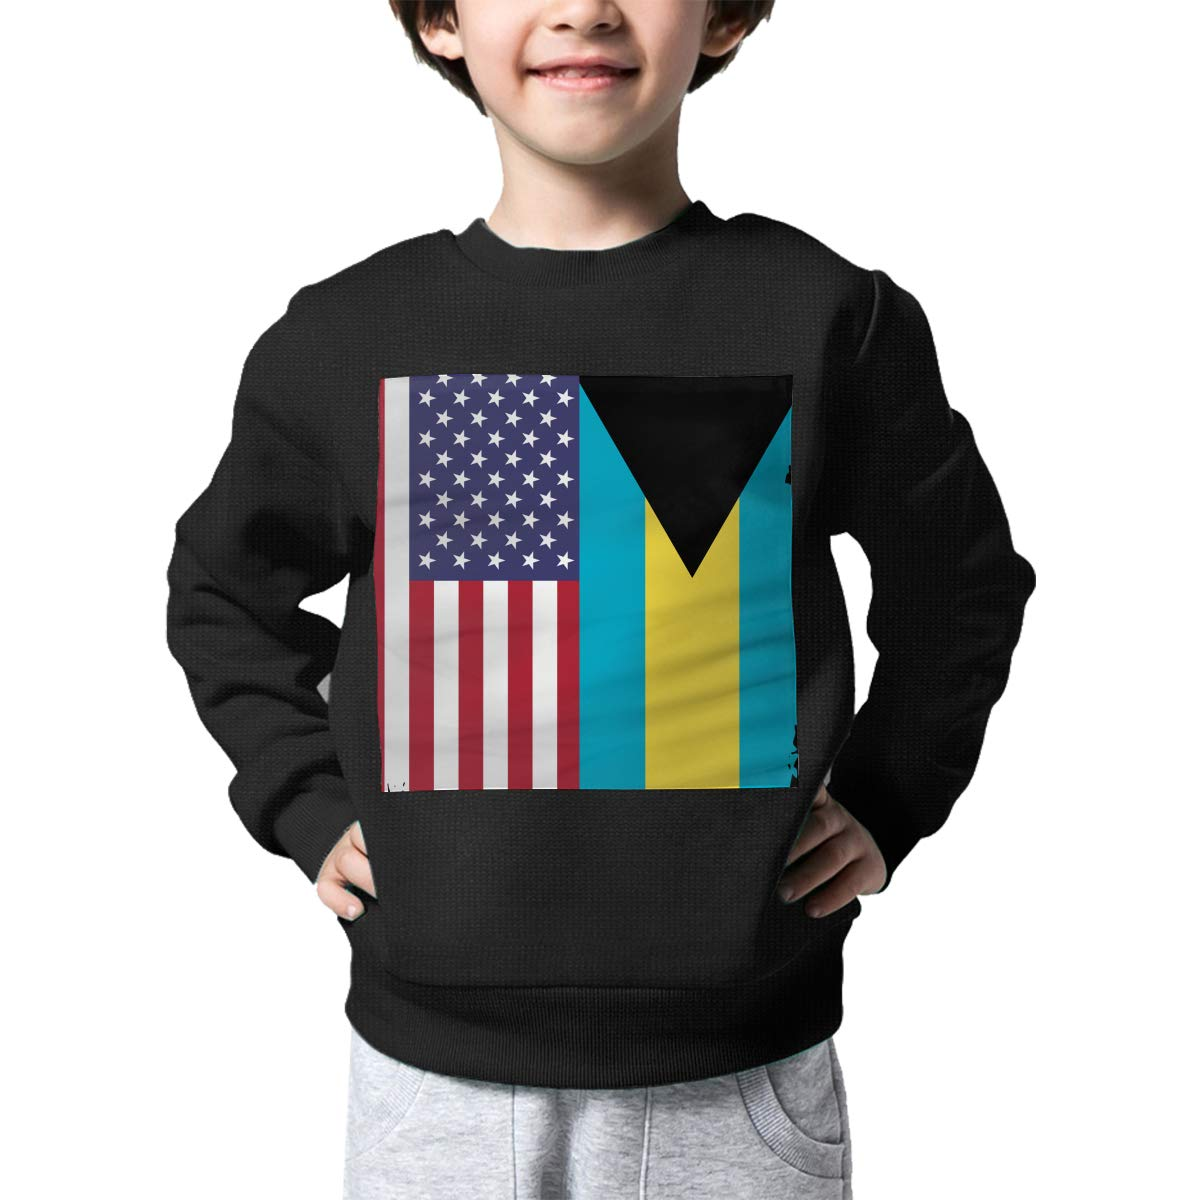 NJKM5MJ Boys Girls American Bahamas Flag Lovely Sweaters Soft Warm Kids Sweater